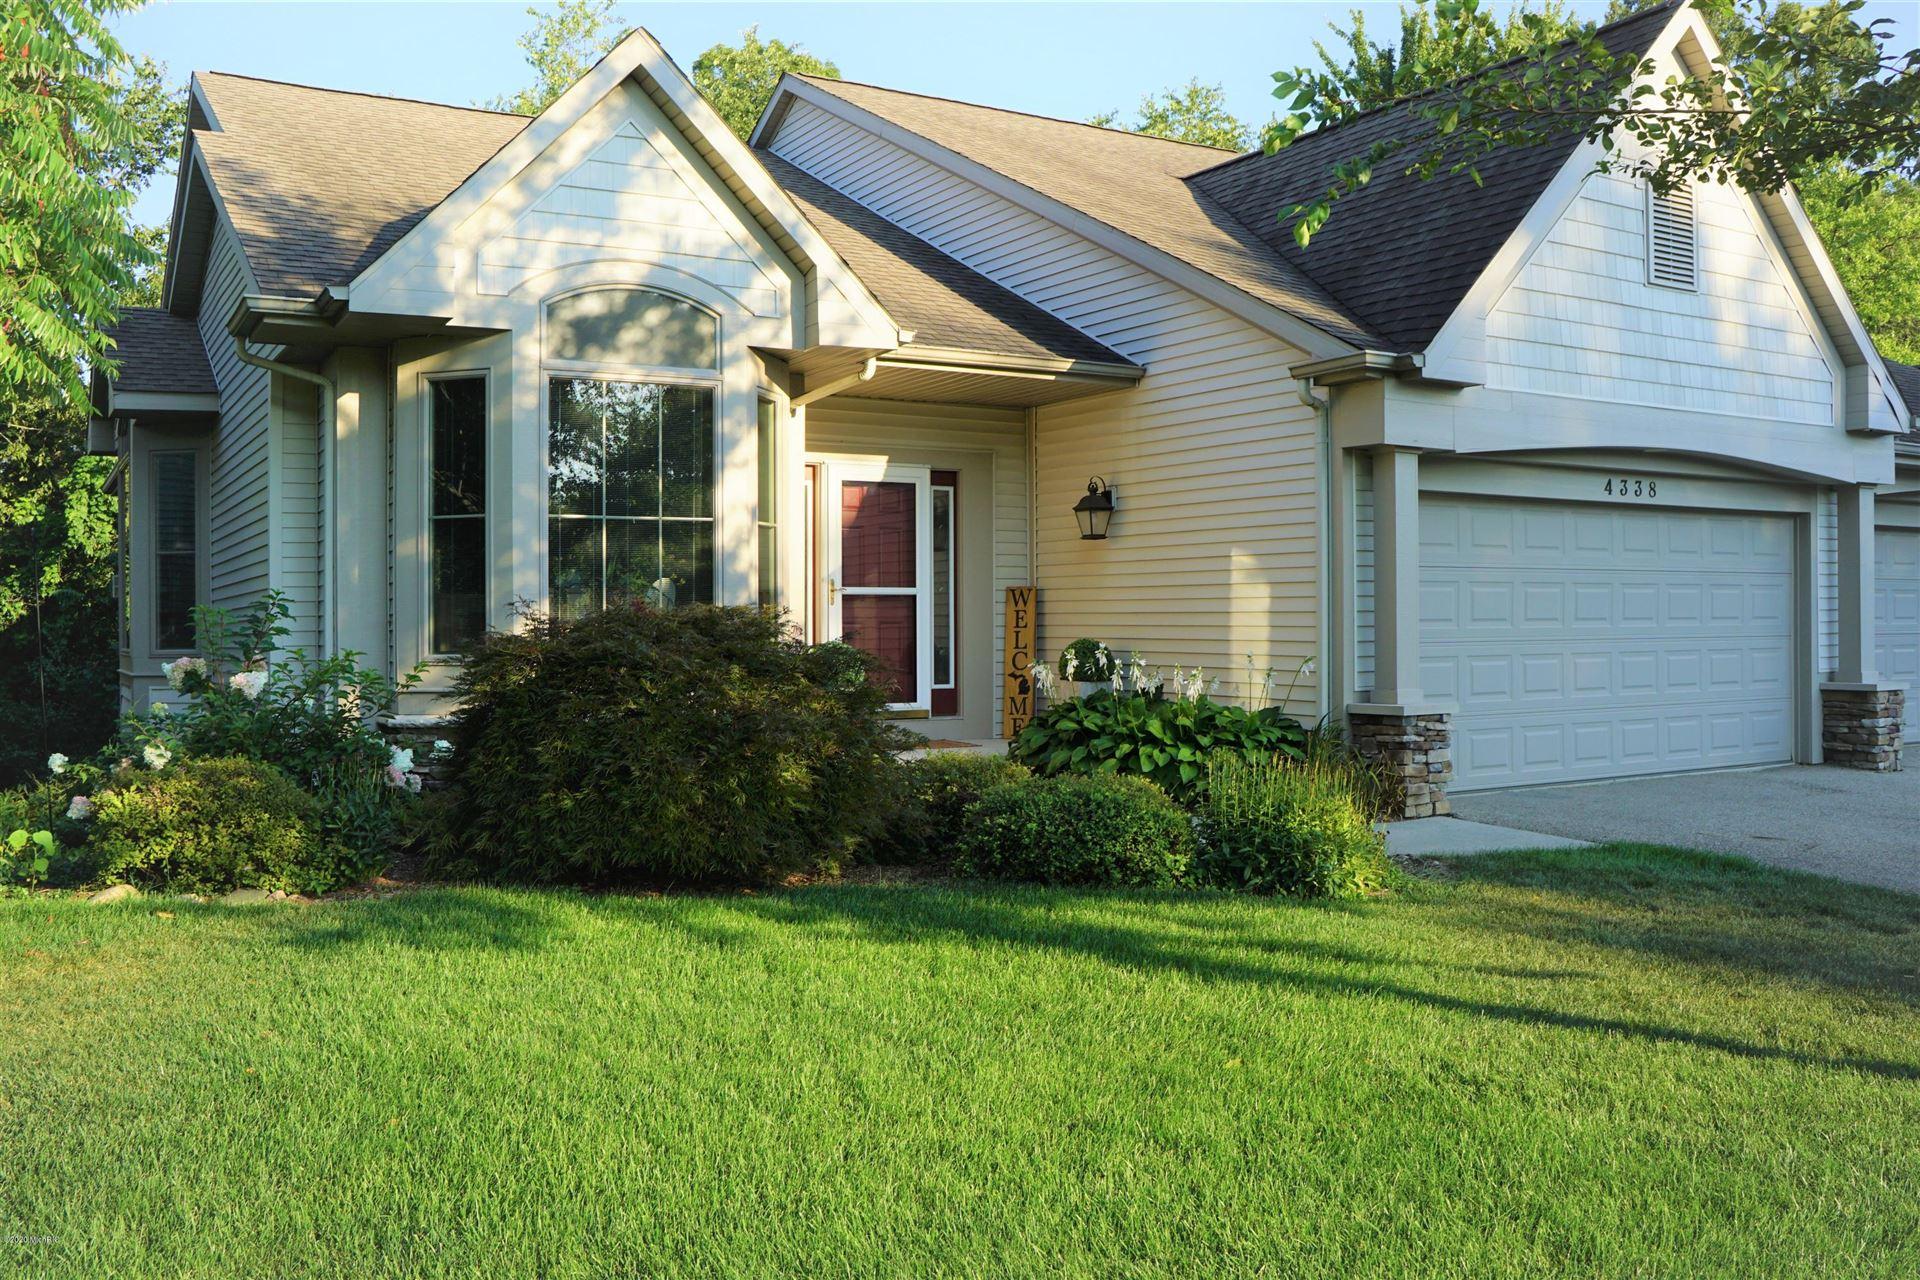 4338 Willow Lane Drive NE, Grand Rapids, MI 49525 - #: 20036186